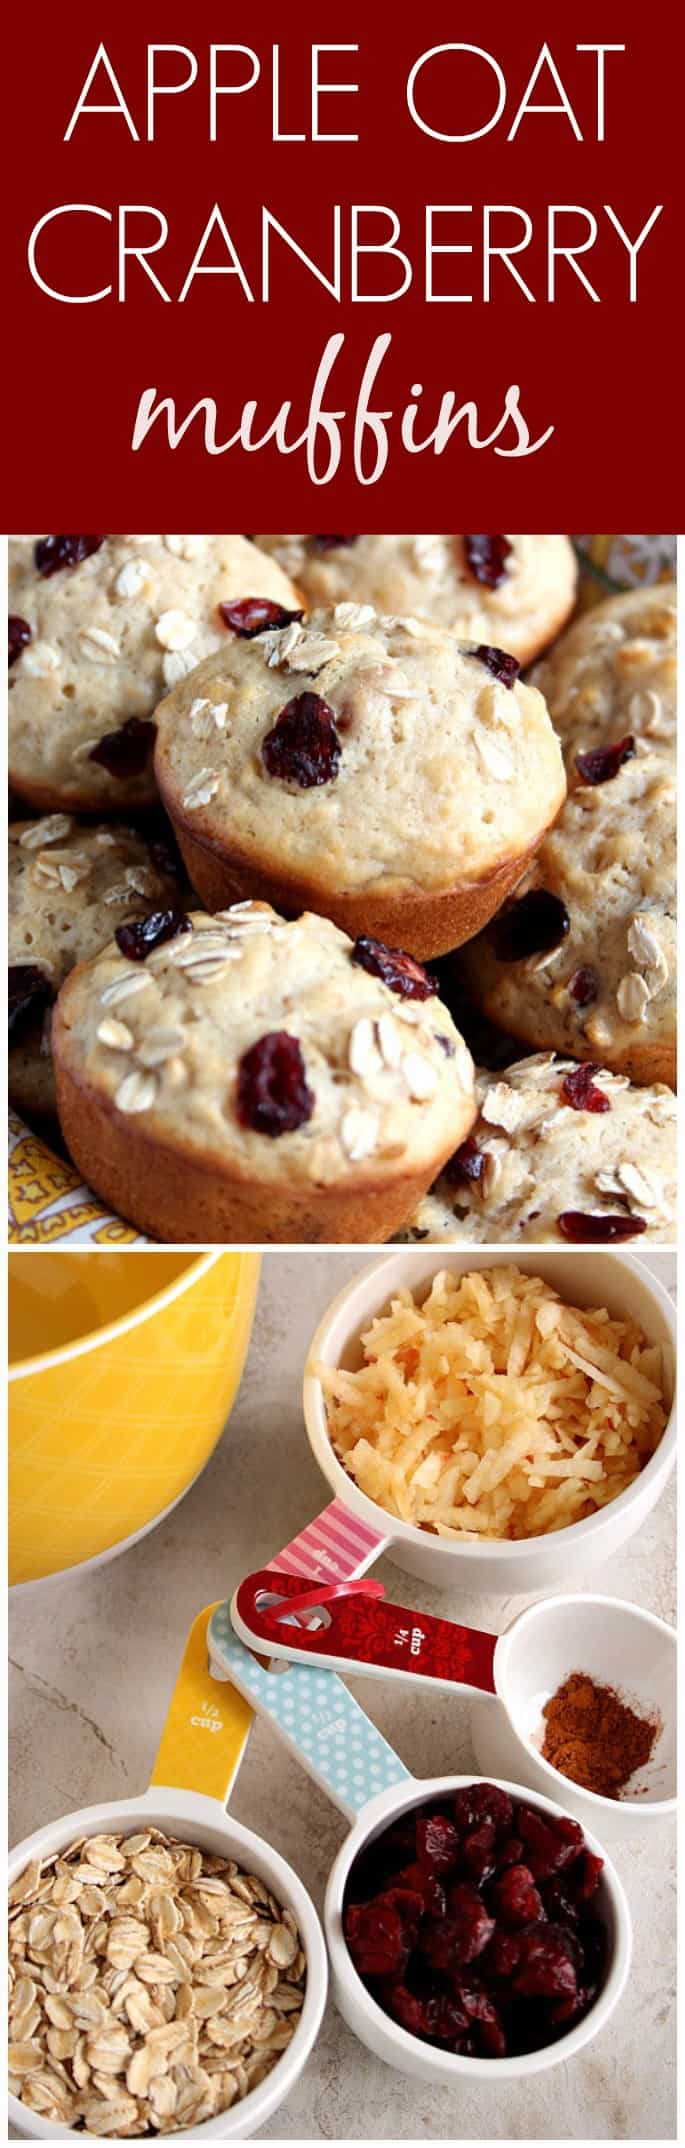 apple oat cranberry muffins recipe Apple Oat Cranberry Muffins Recipe